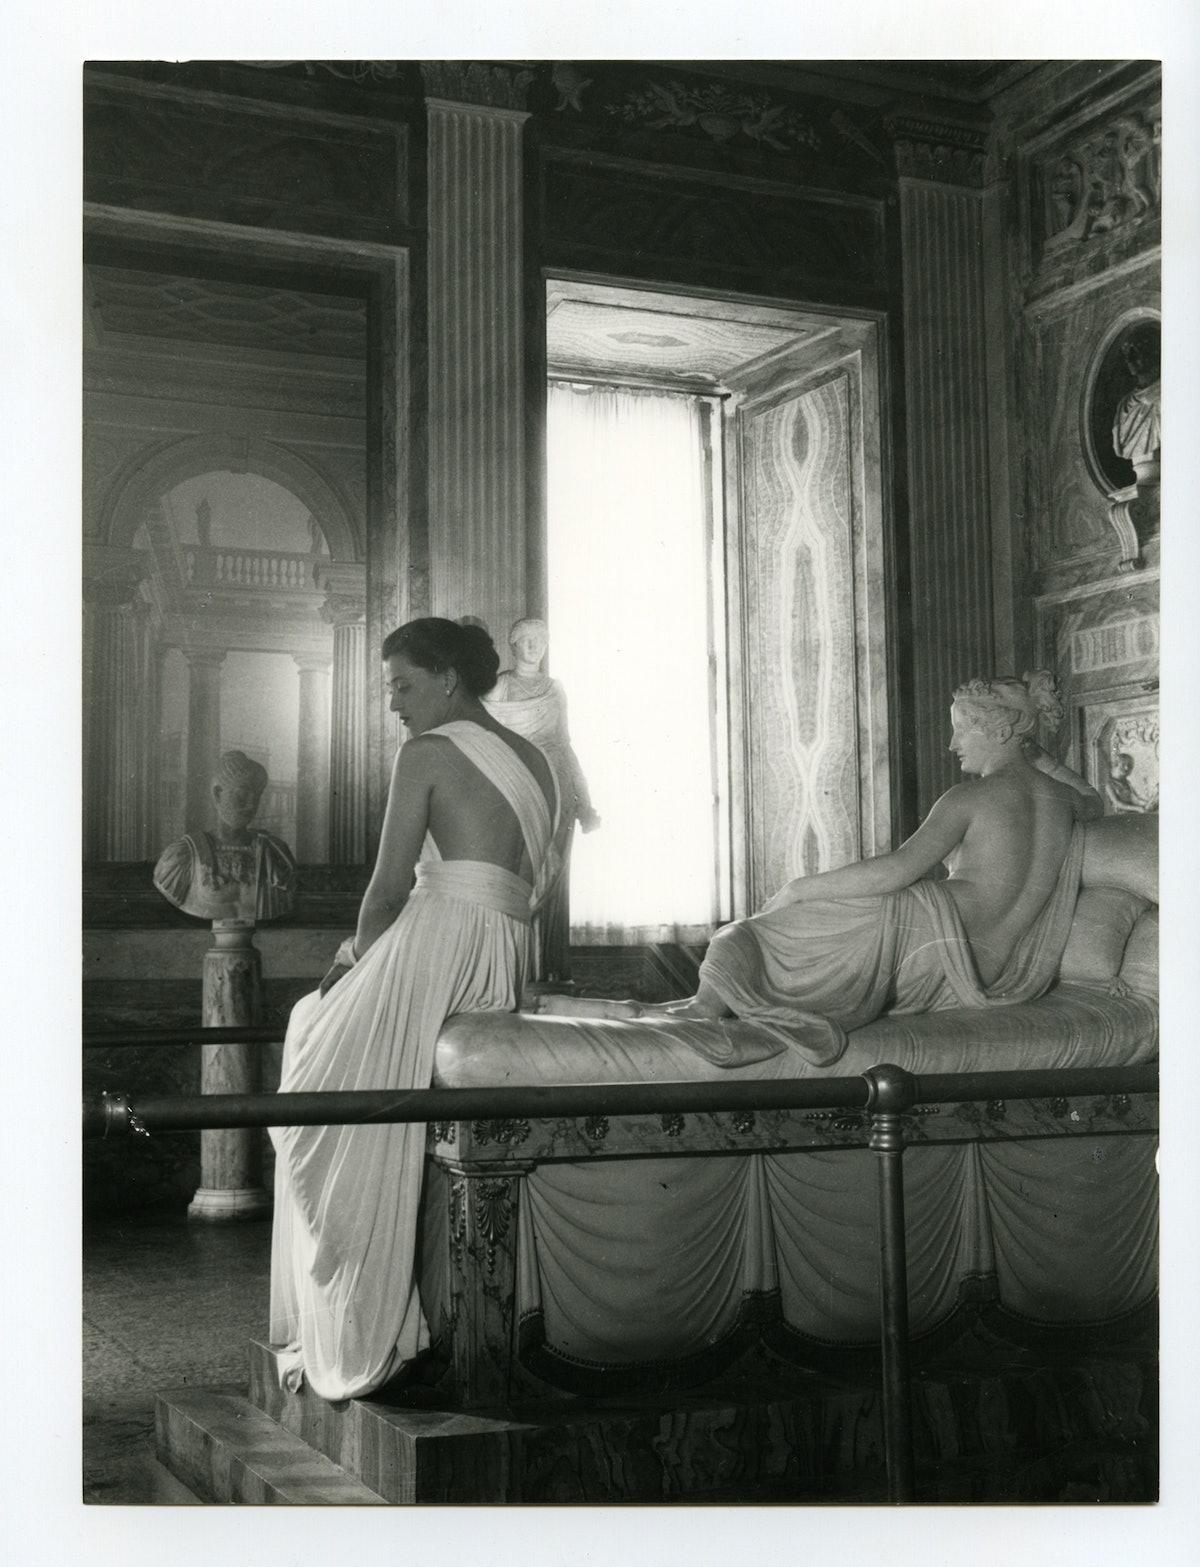 Pasquale-De-Antonis_Canovas-sculpture-of-Pauline-Bonaparte-Borghese-come-to-life-wearing-a-white-fox...